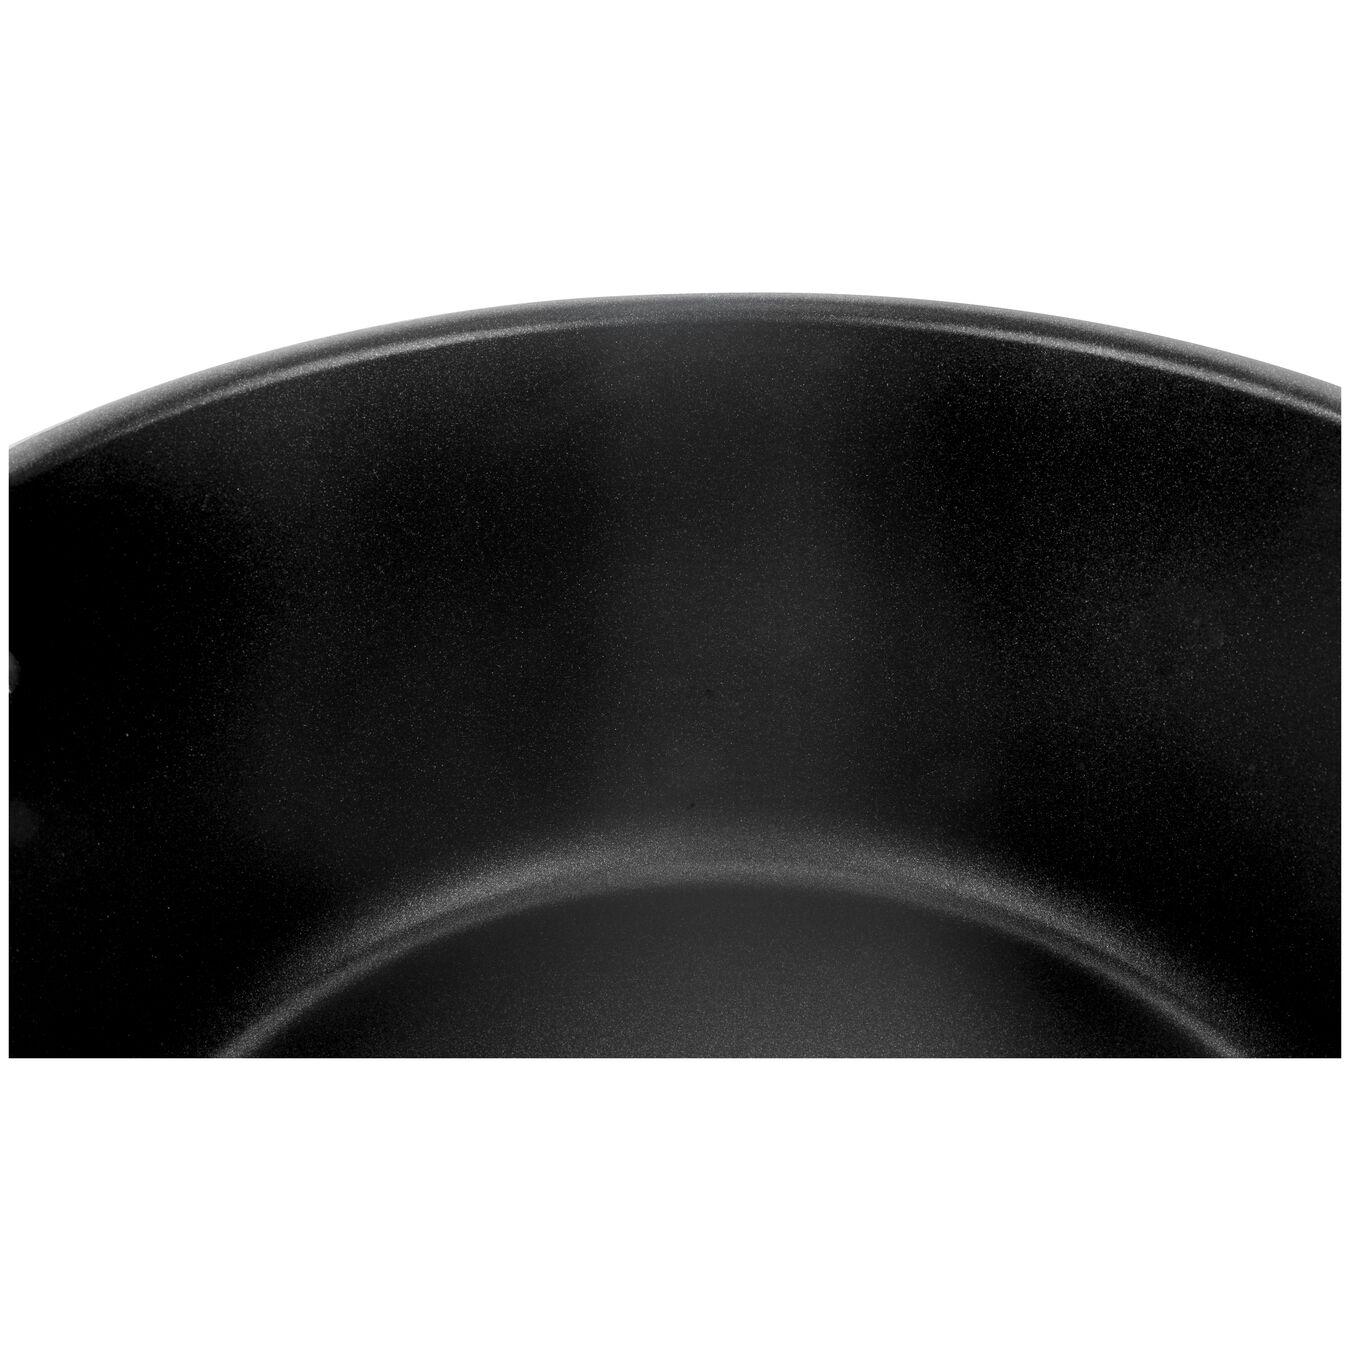 Aluminum round Sauce pan, Silver-Black,,large 4